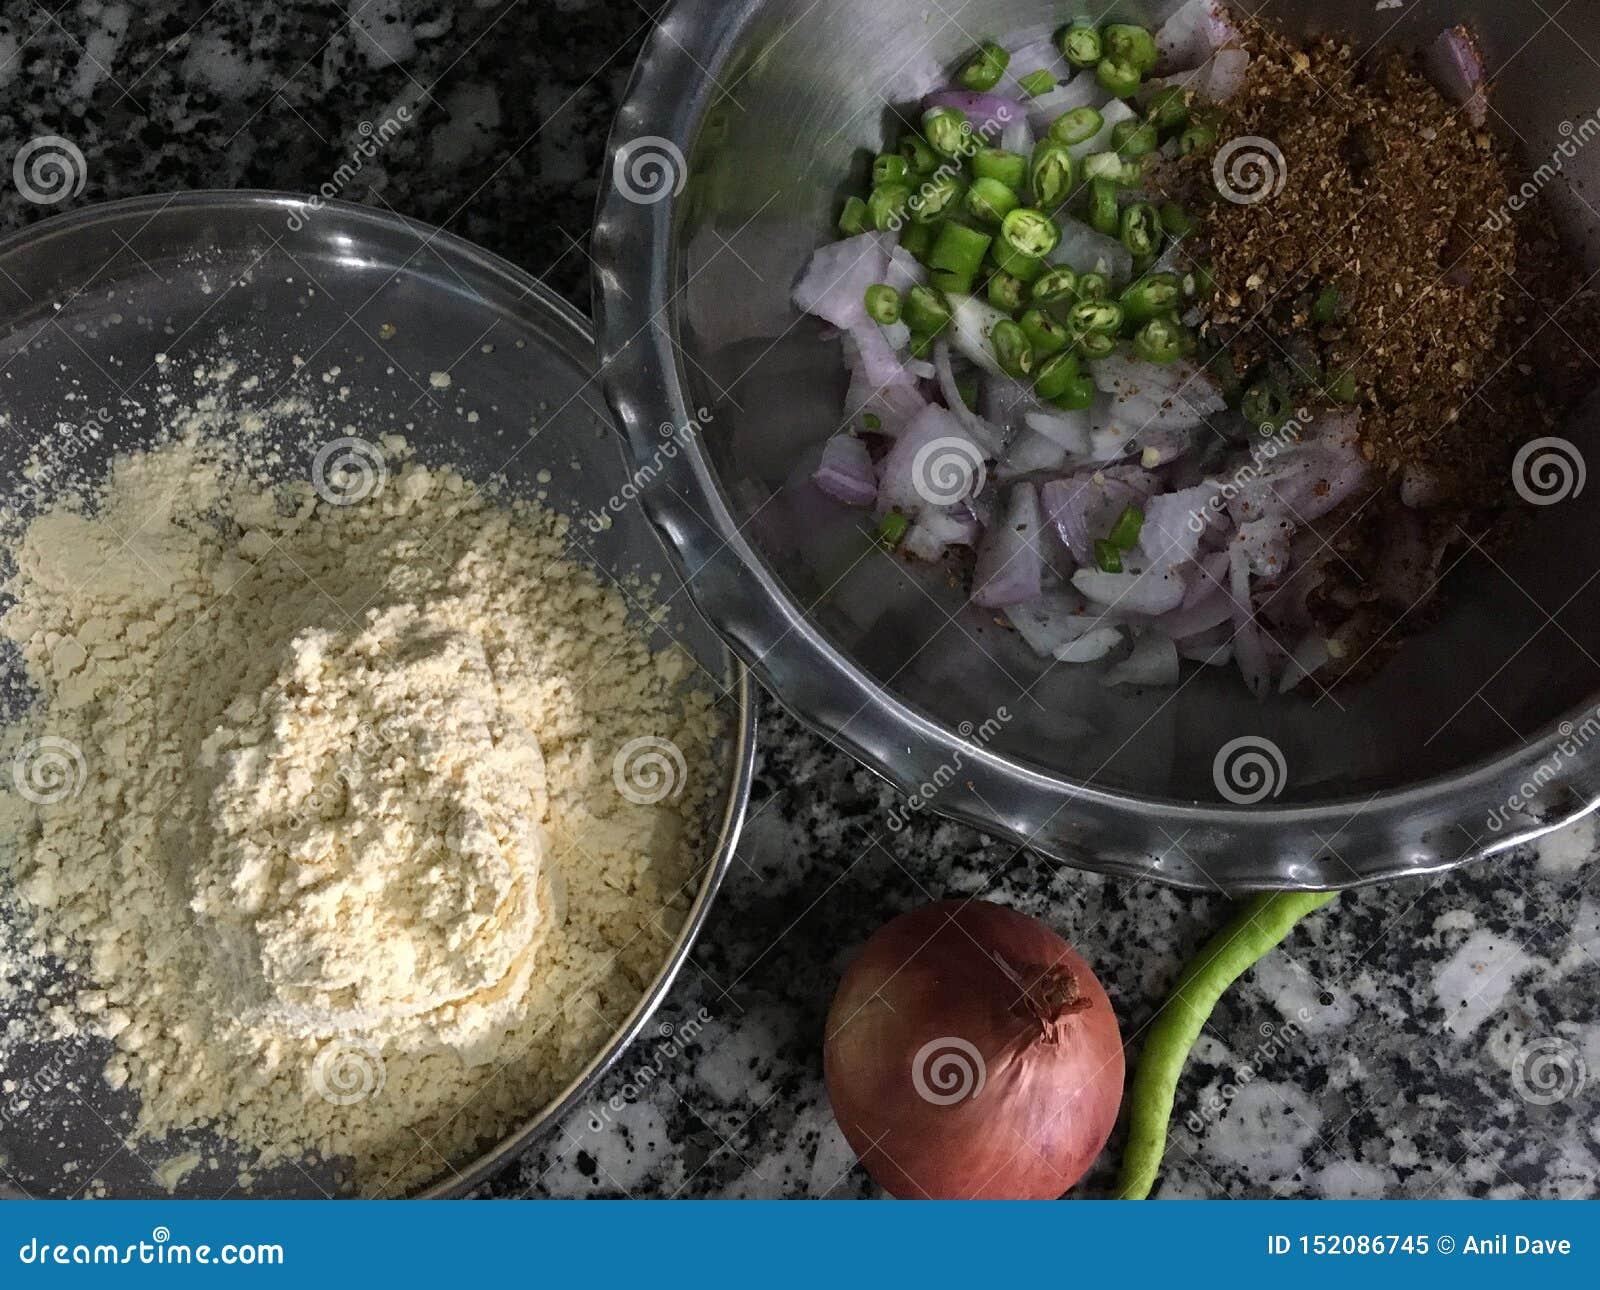 Ingrediënten voor kandabhajionion Pakora worden opgesteld in moesson Kalyan Maharashtra INDIA dat